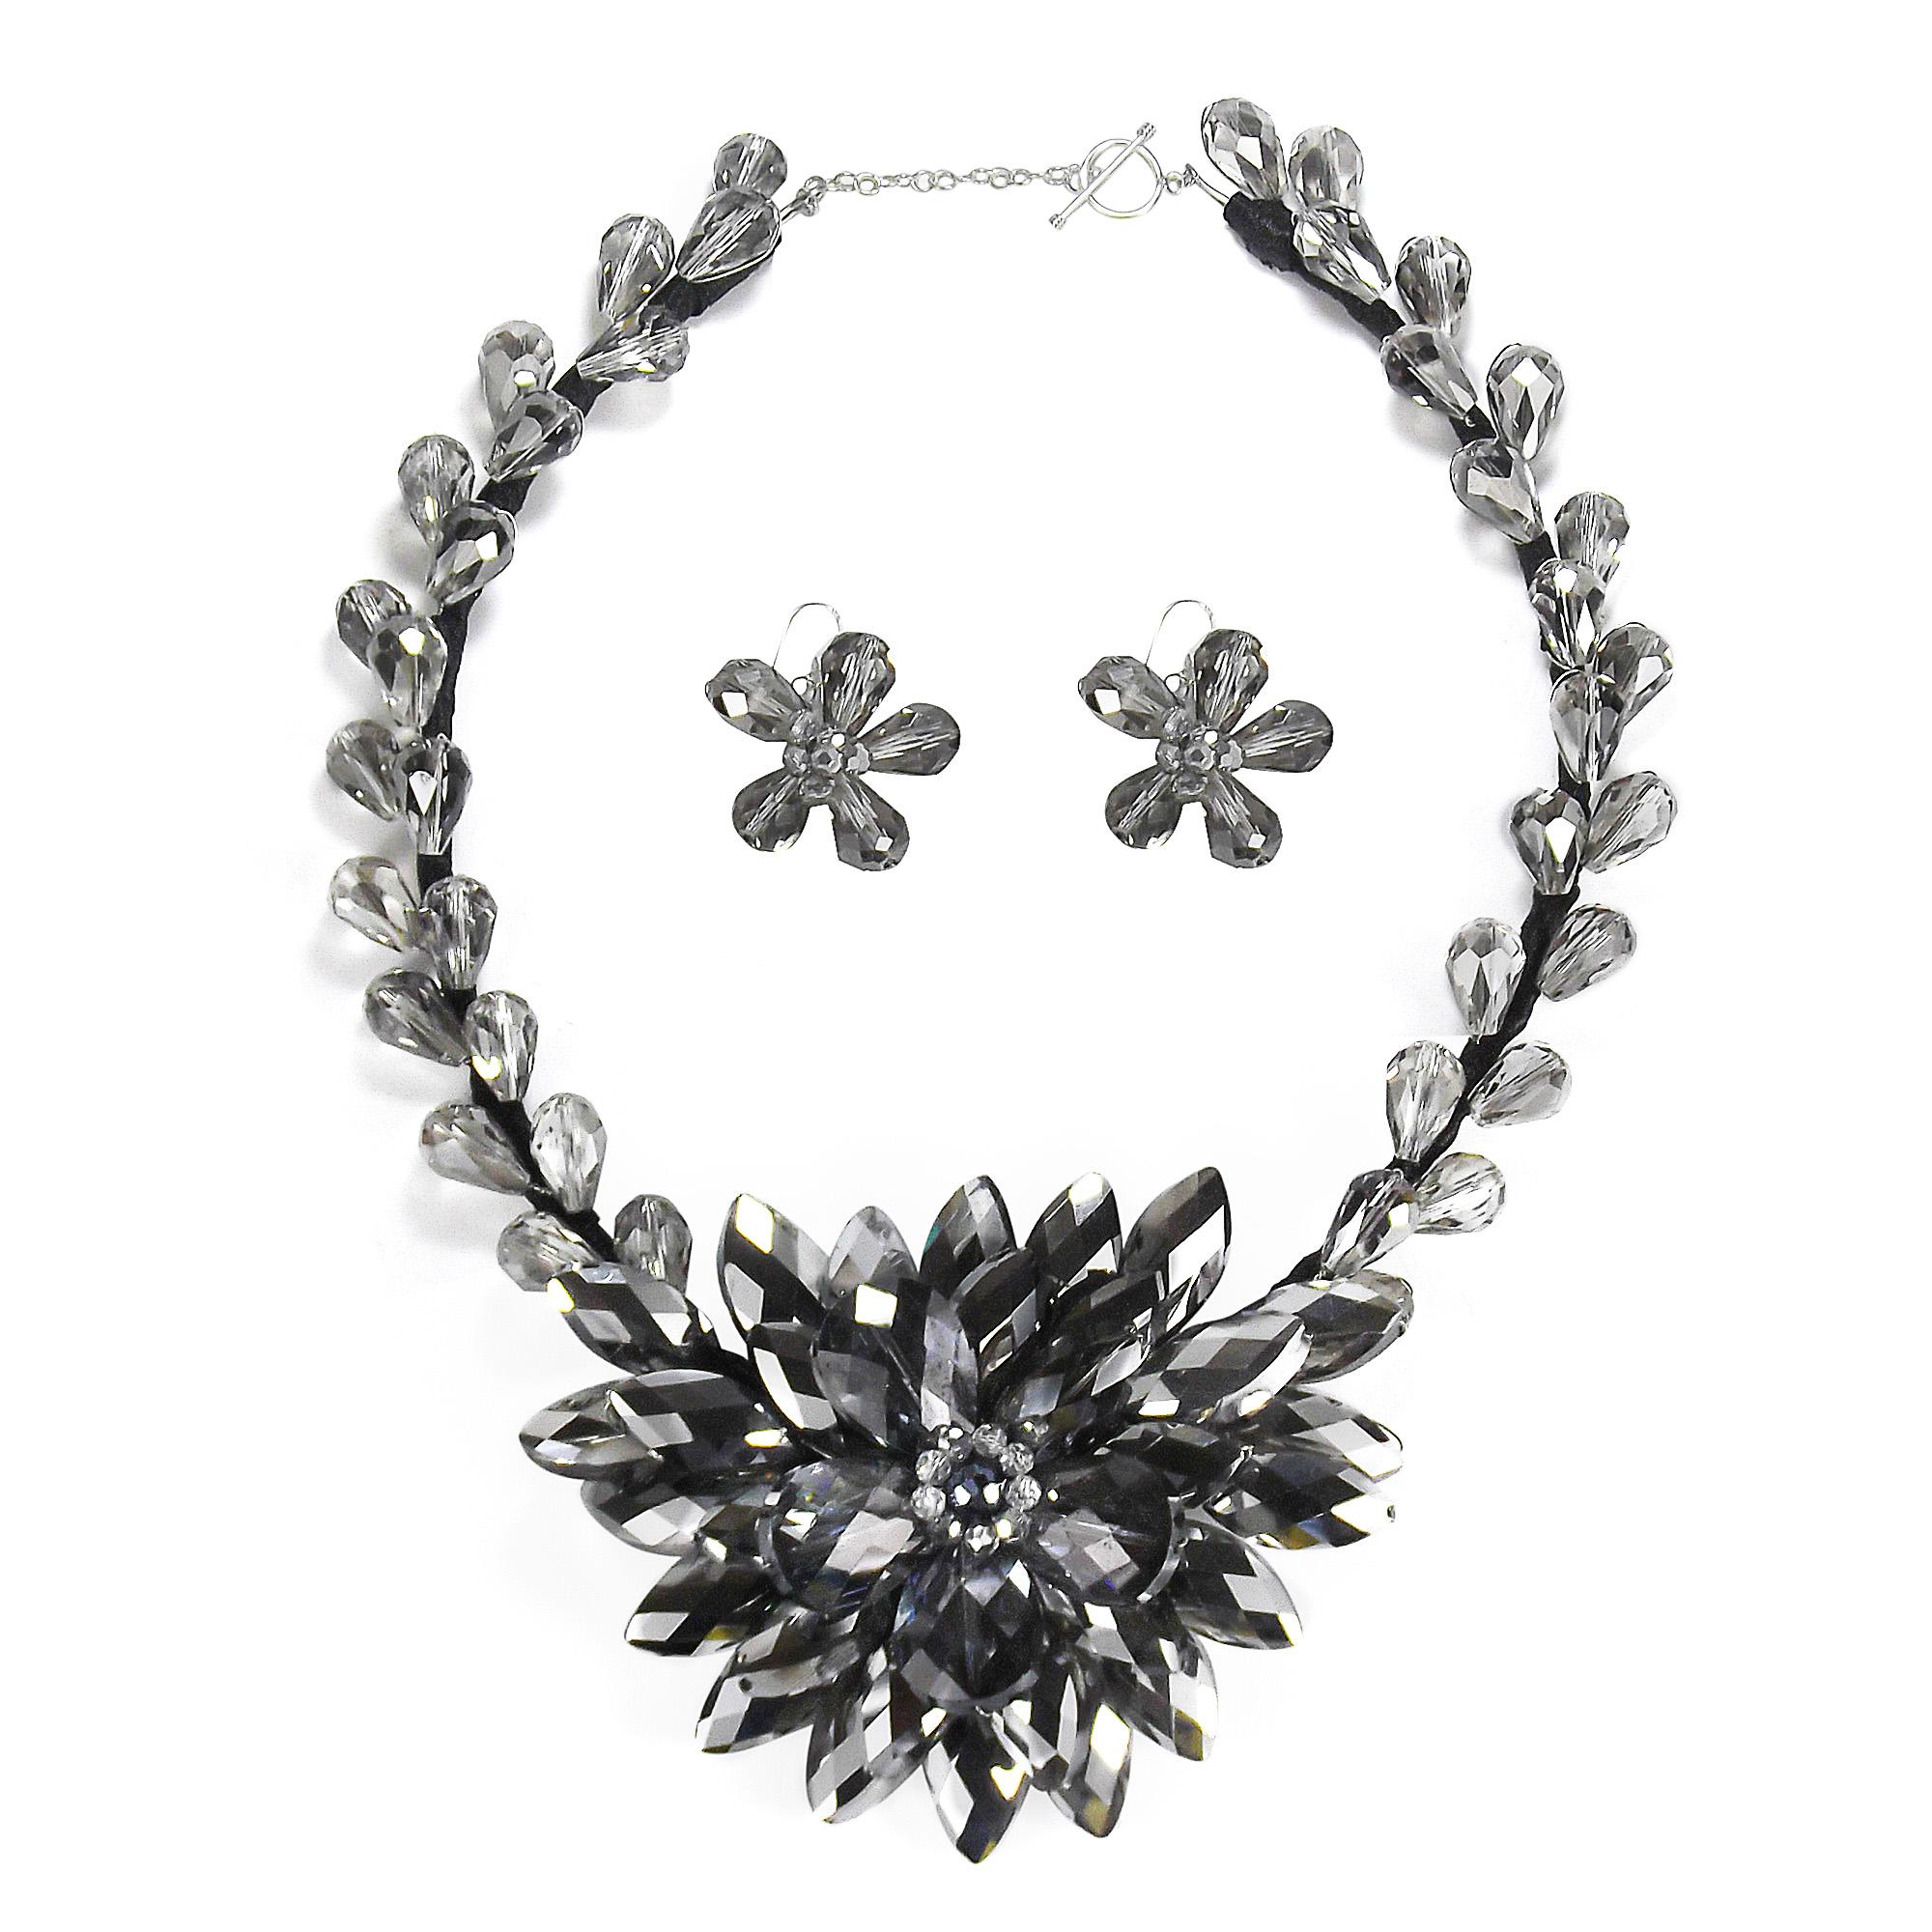 Silver lotus flower bloom dazzling crystals jewelry set aeravida lotus flower bloom dazzling crystals jewelry set product izmirmasajfo Images